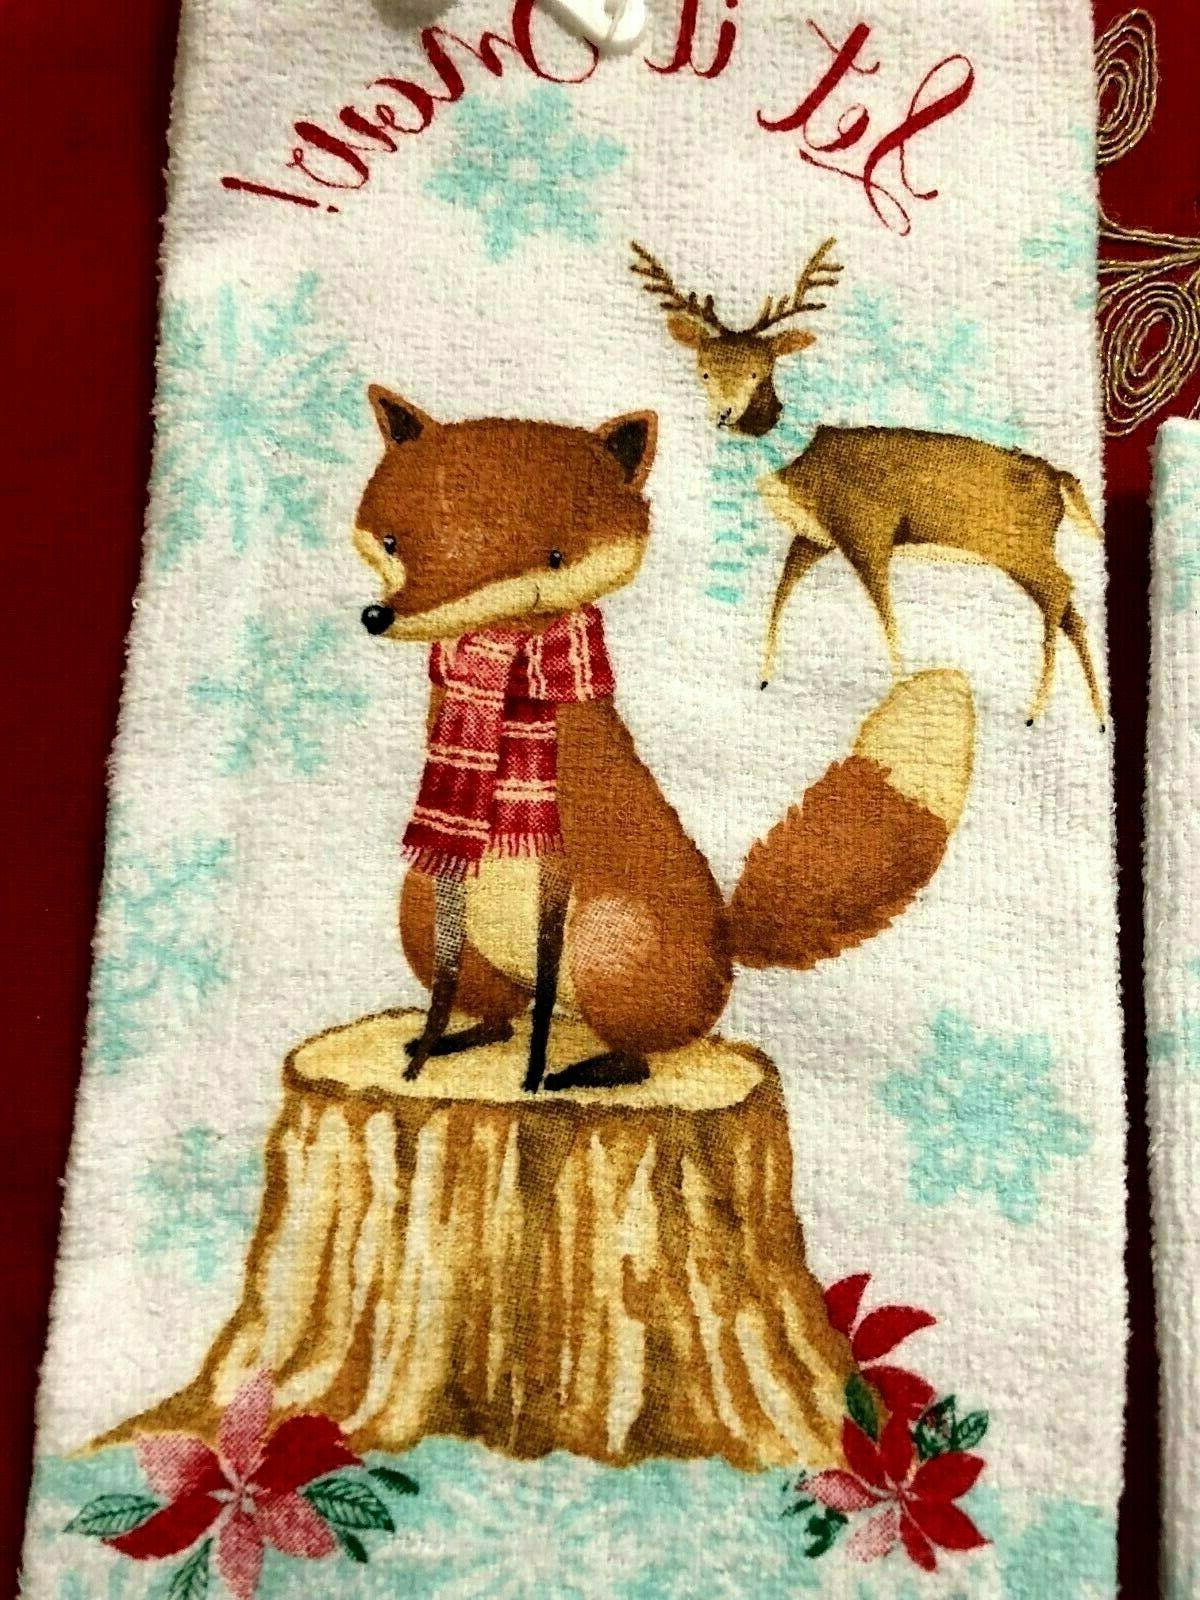 Christmas Kitchen -Let It Snow Christmas Cotton